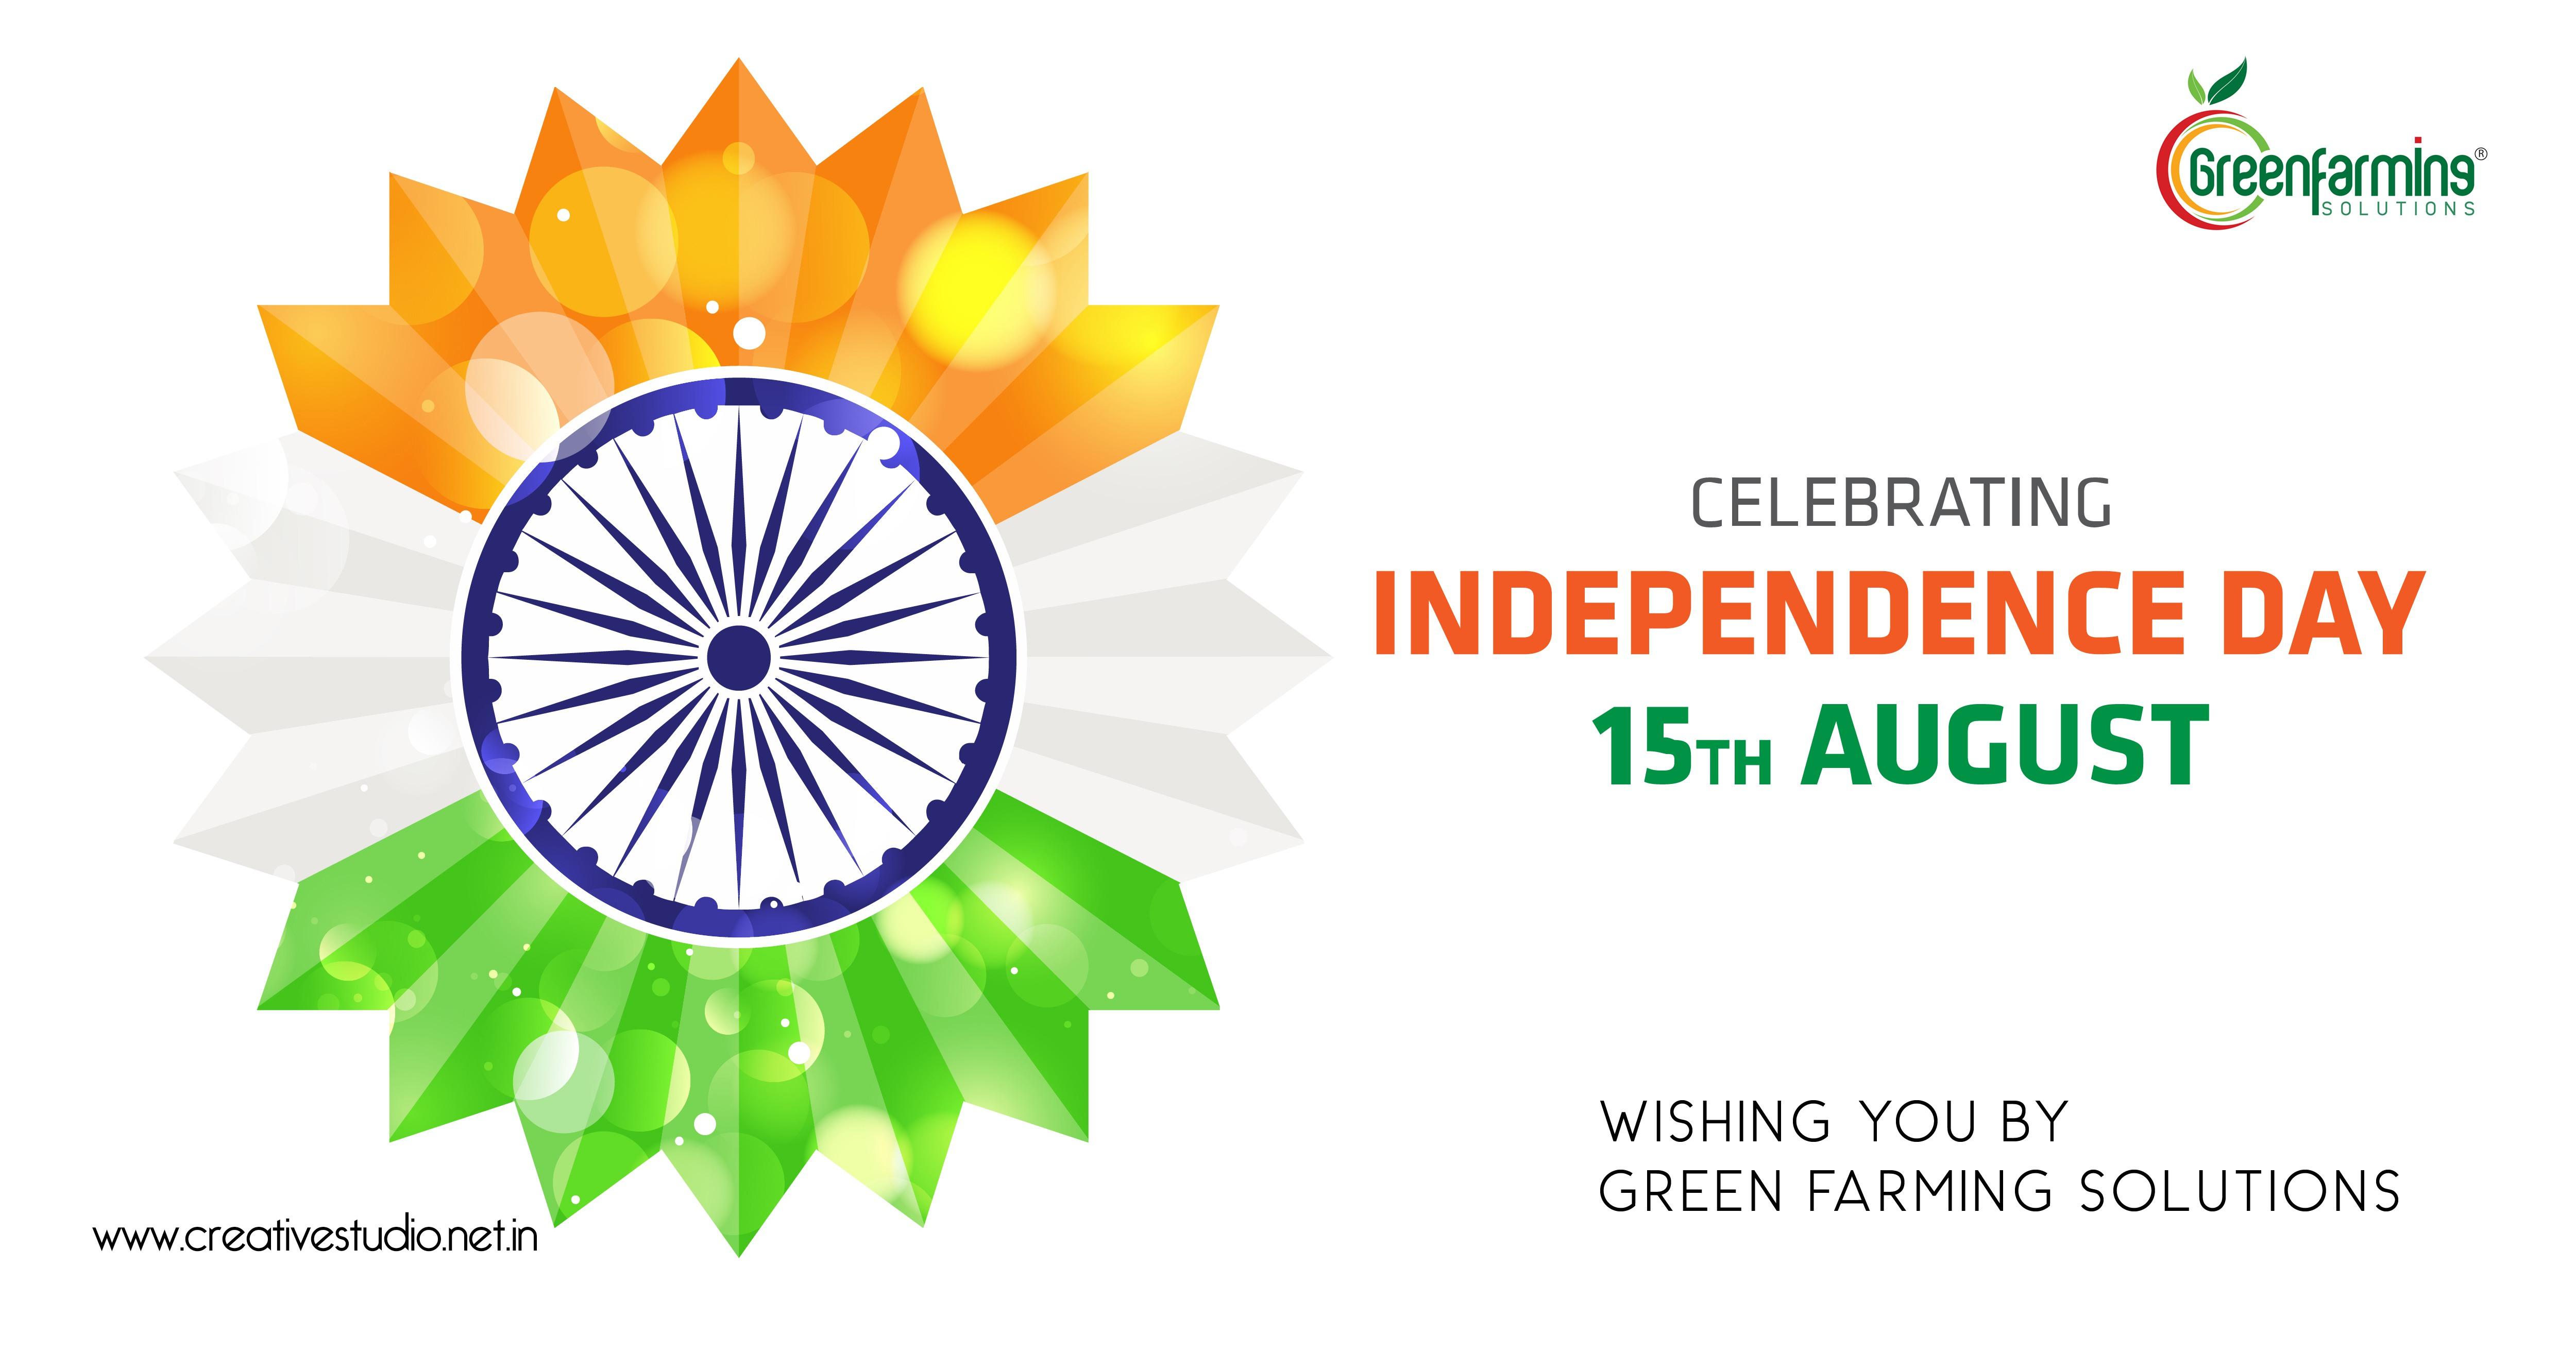 7 Green Farming Solutions Independec day celebration 07 - Social Media Creatives